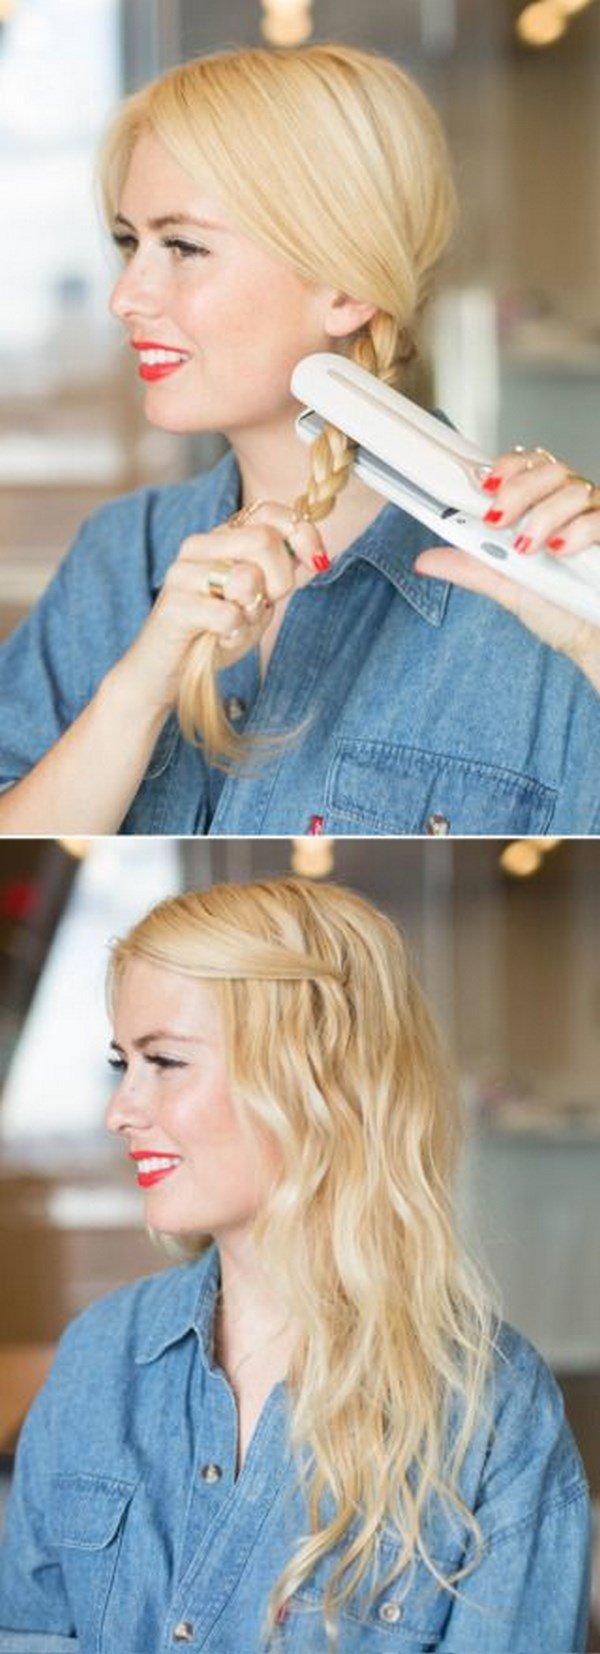 hermoso peinado ondulado